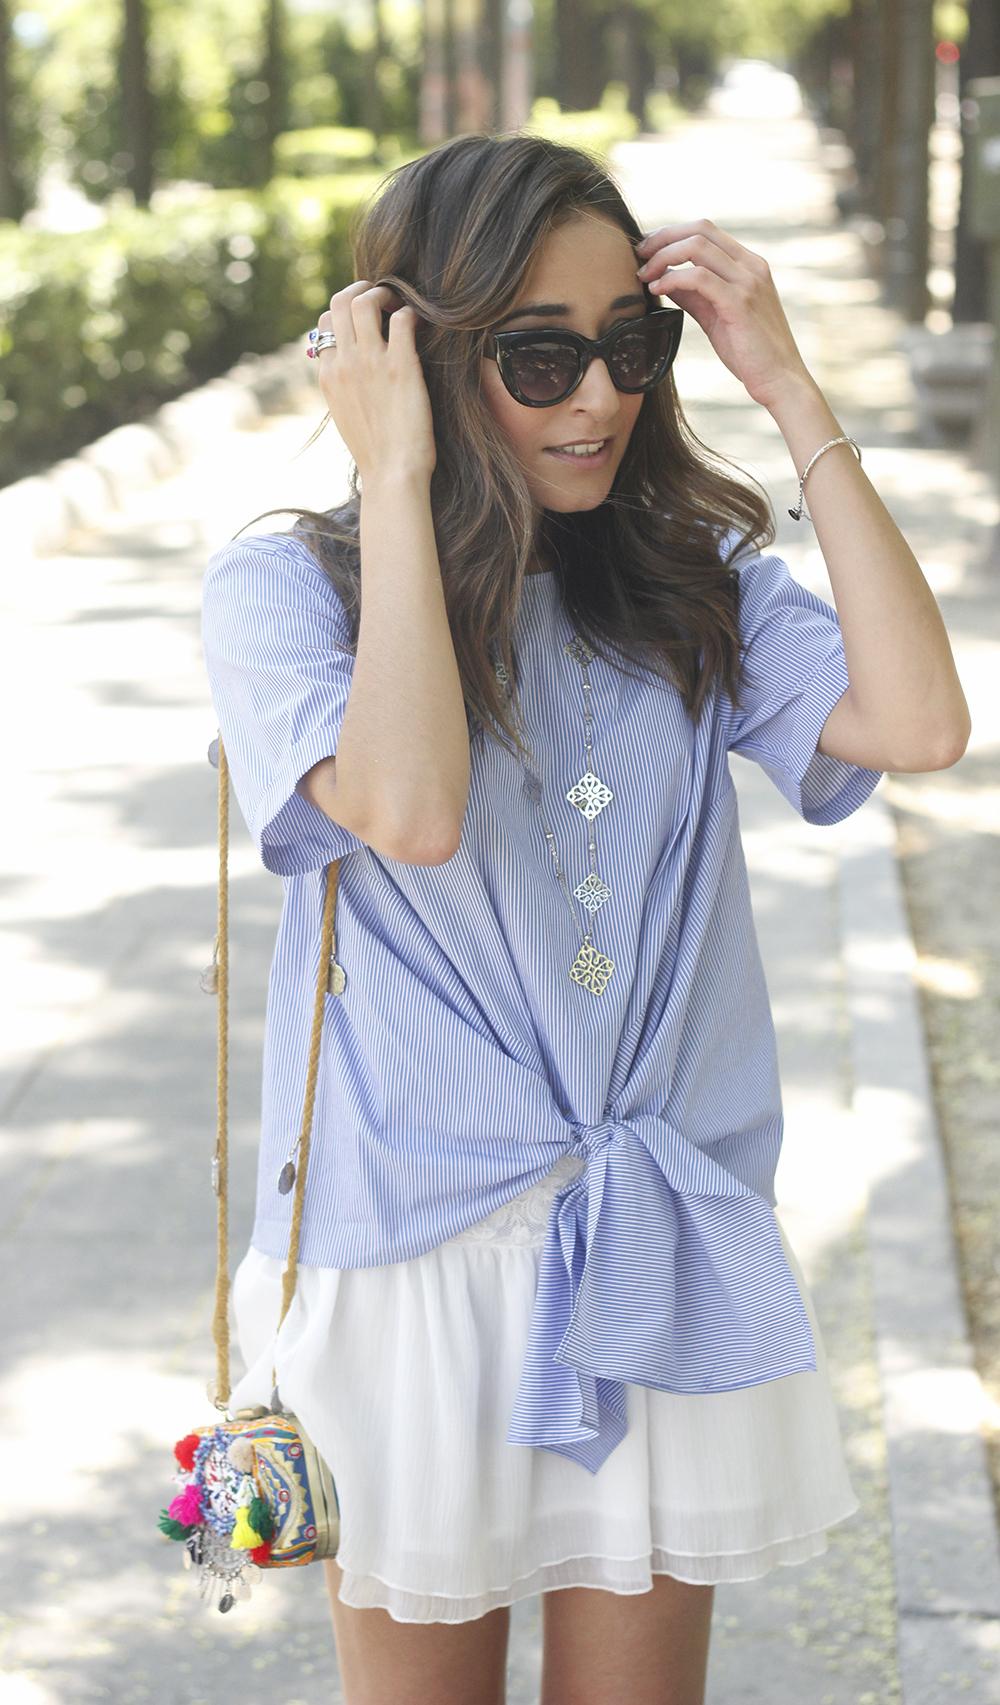 Knotted striped shirt white skirt brosway jewels summer outfit carolina herrera heelsfashion style12